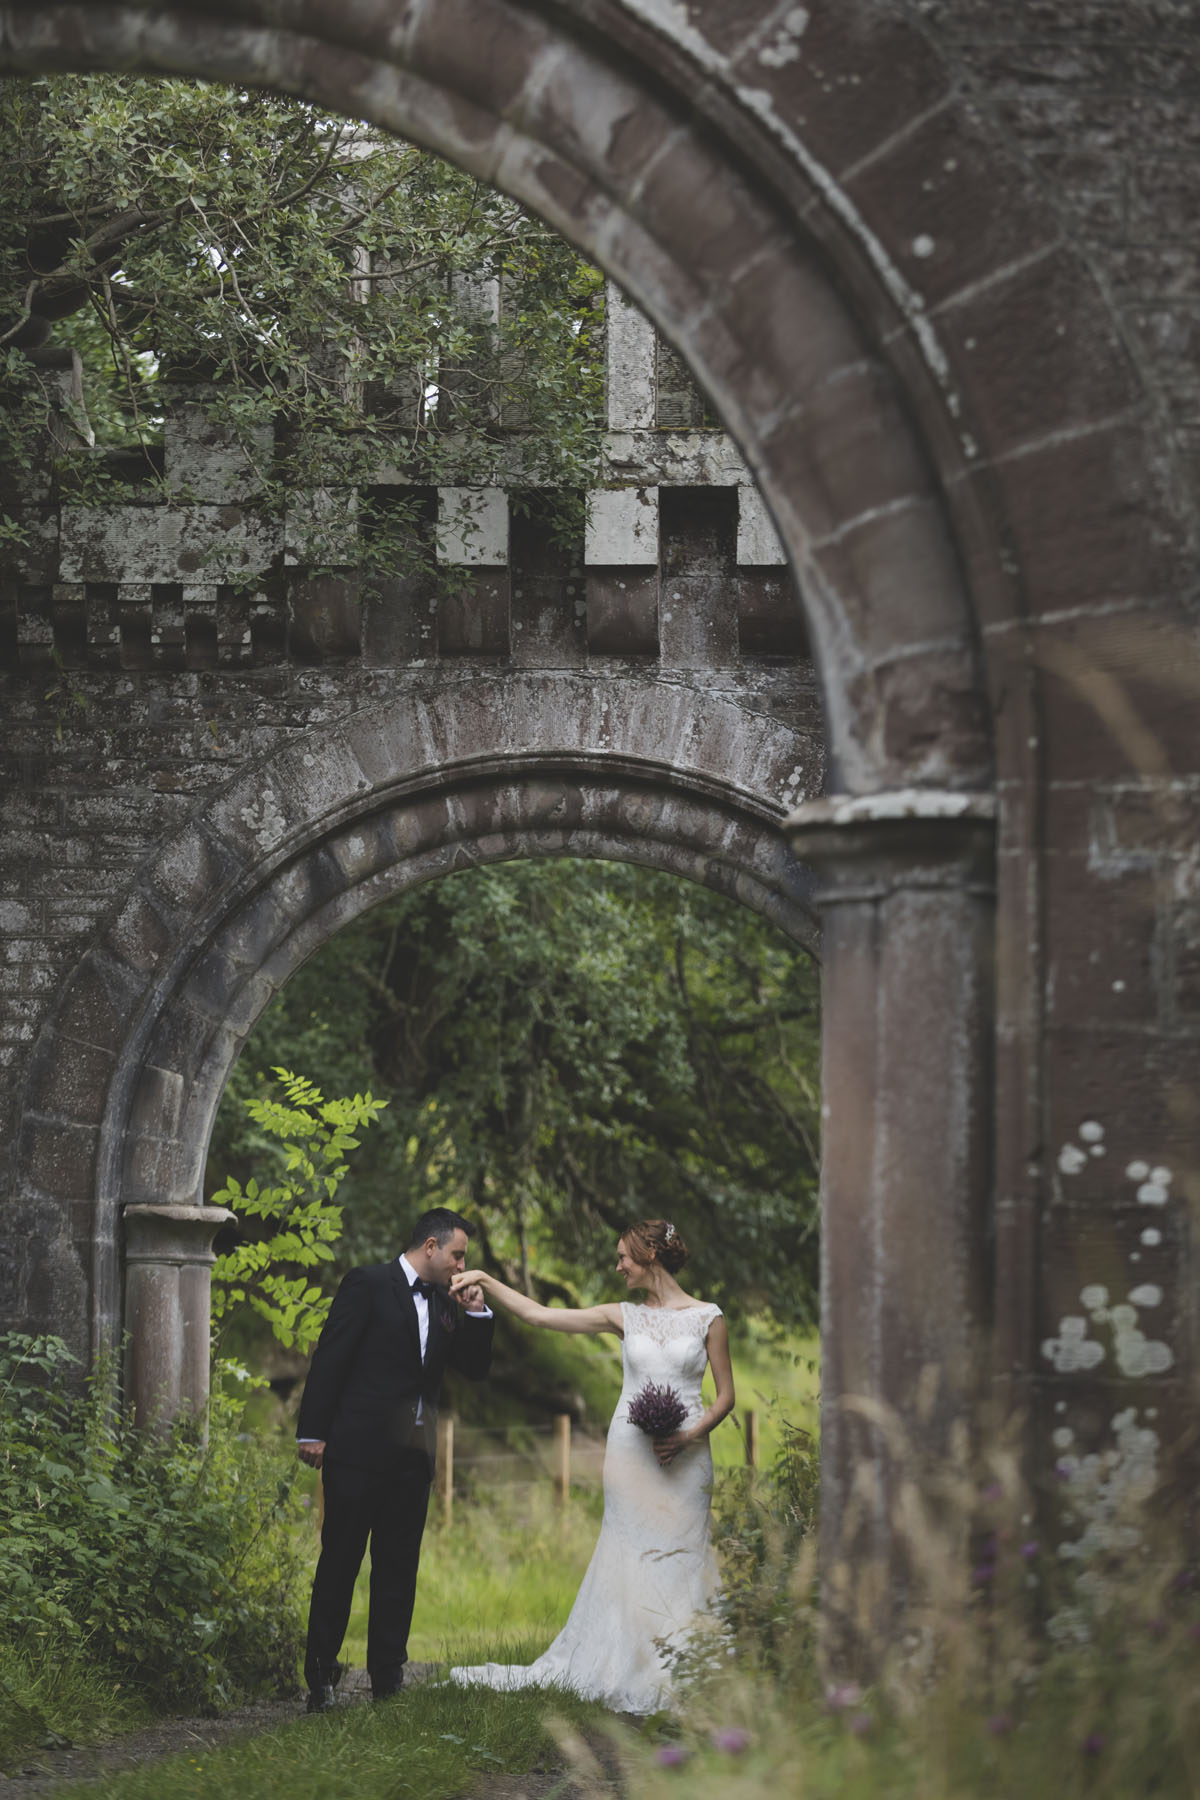 pulmafotod-061-scotland-wedding-photo.jpg